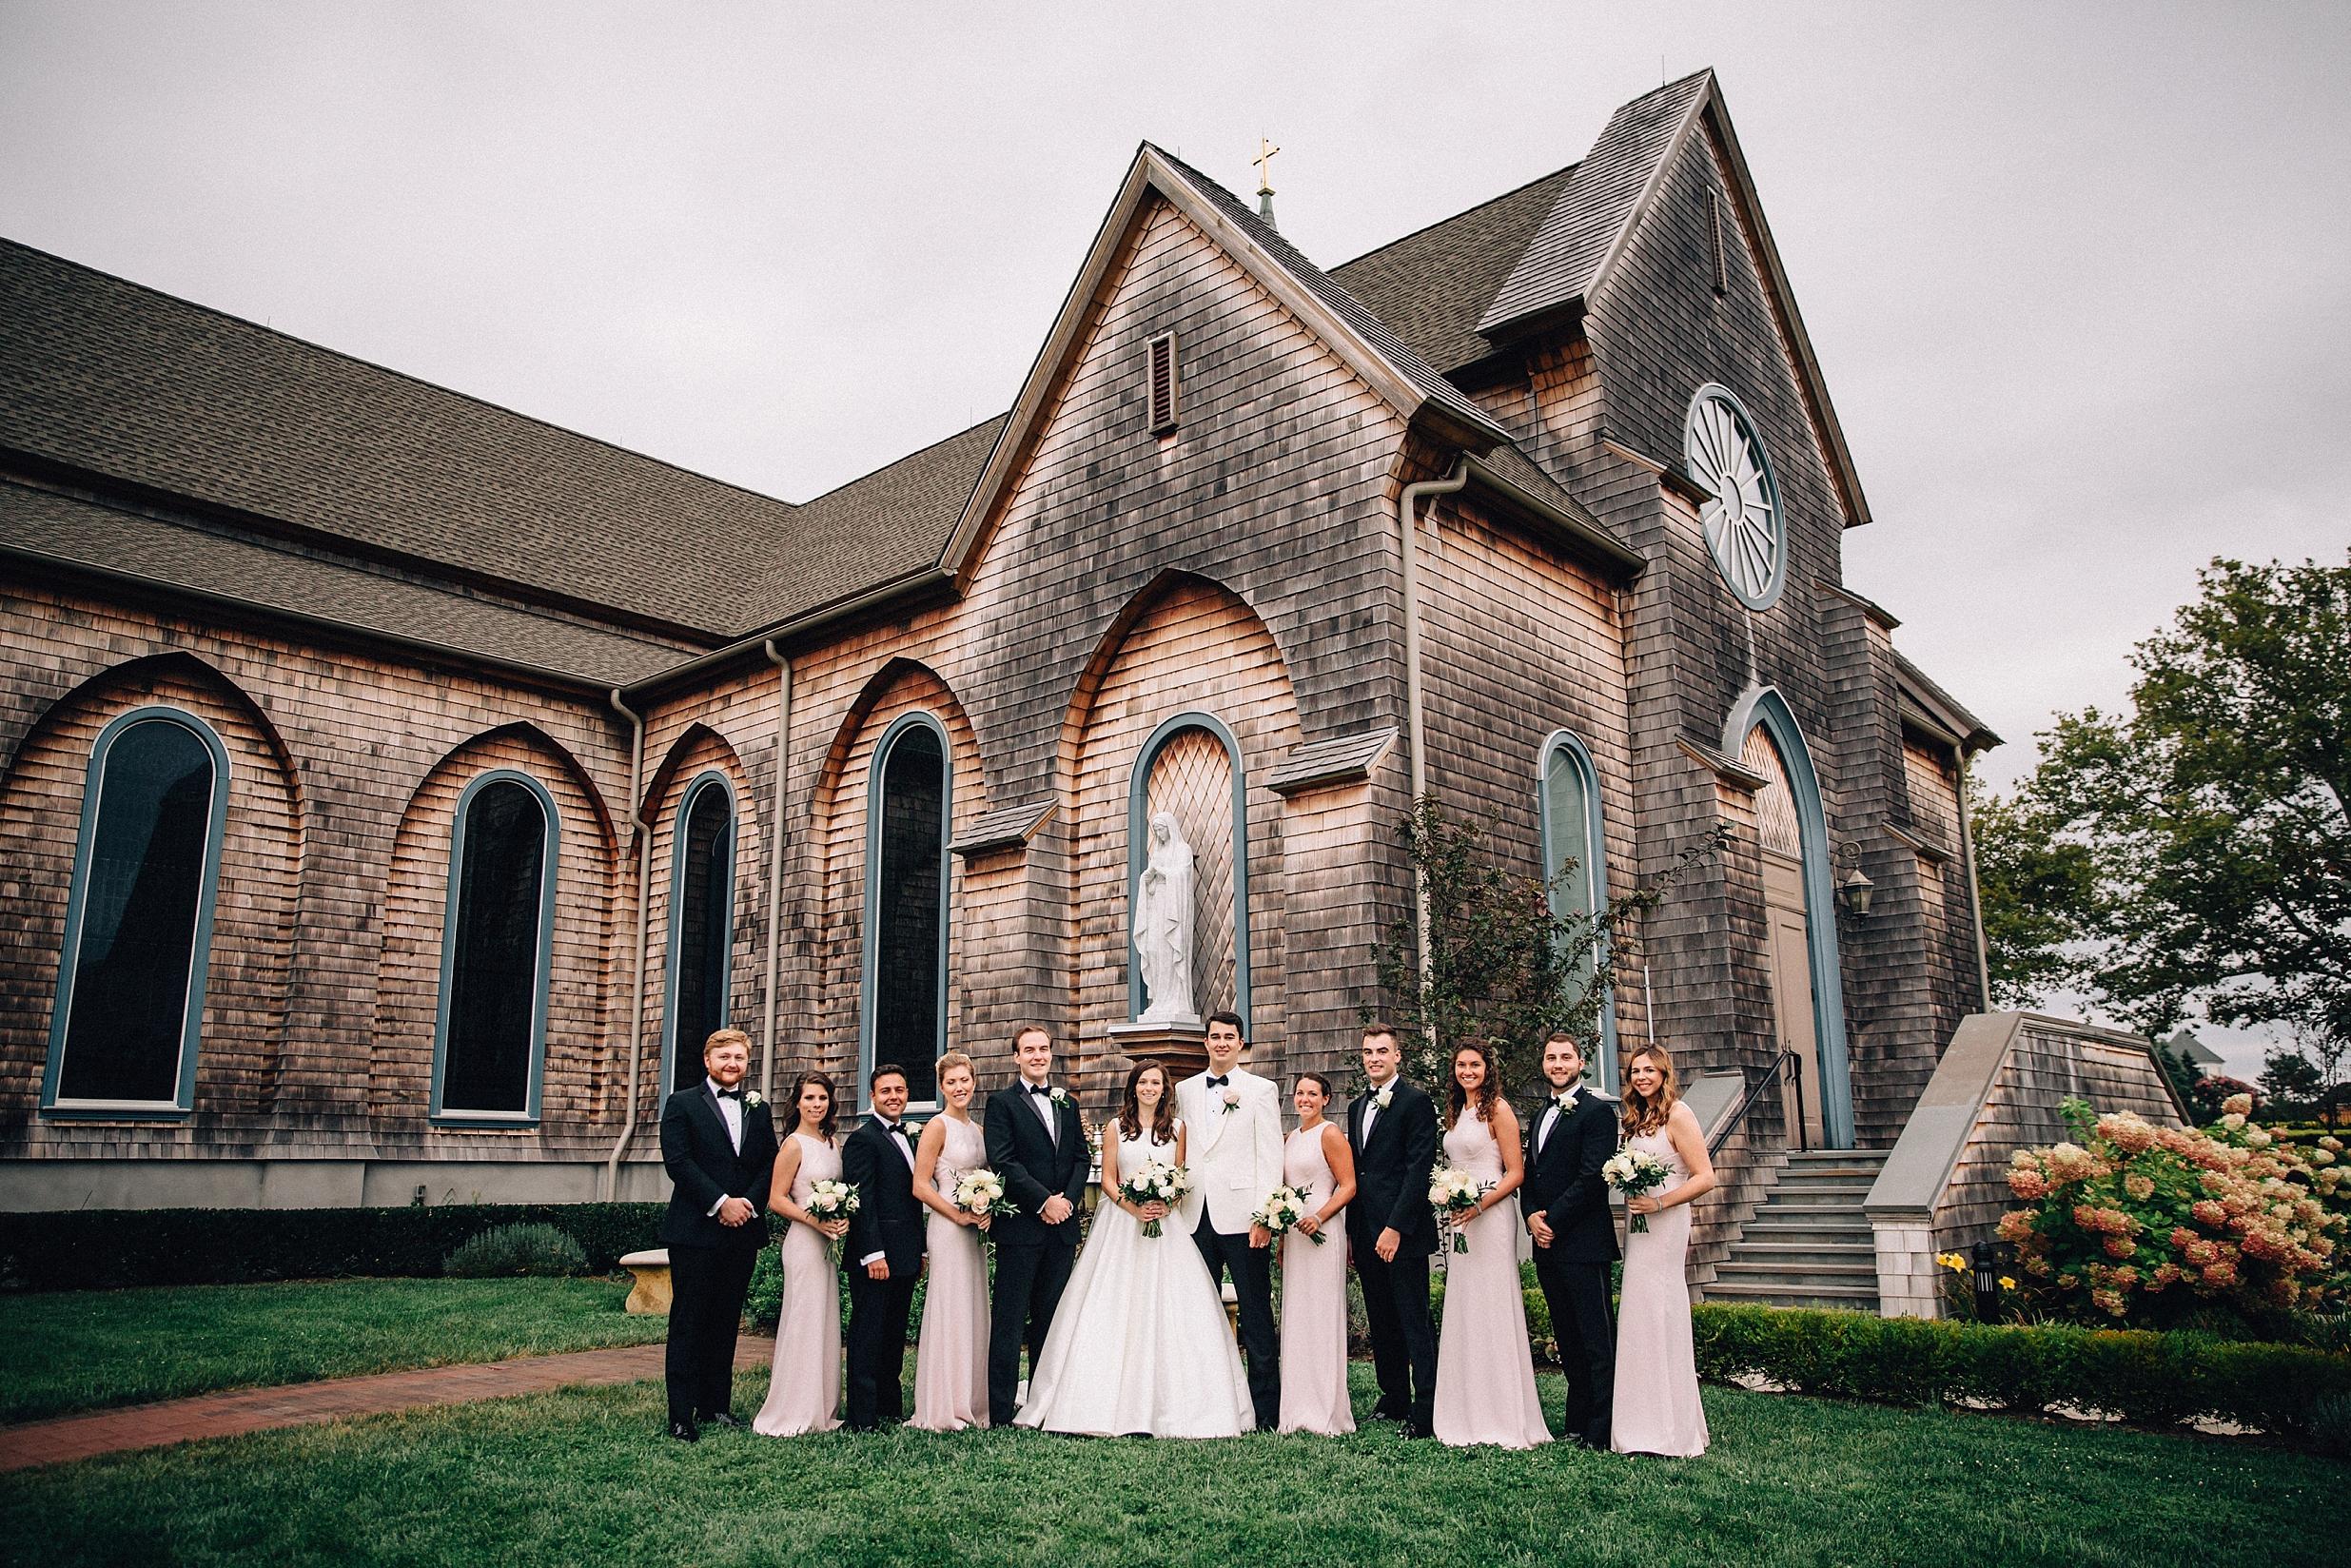 rumson-tented-wedding-nj-maine-conneticut-classic_0024.jpg